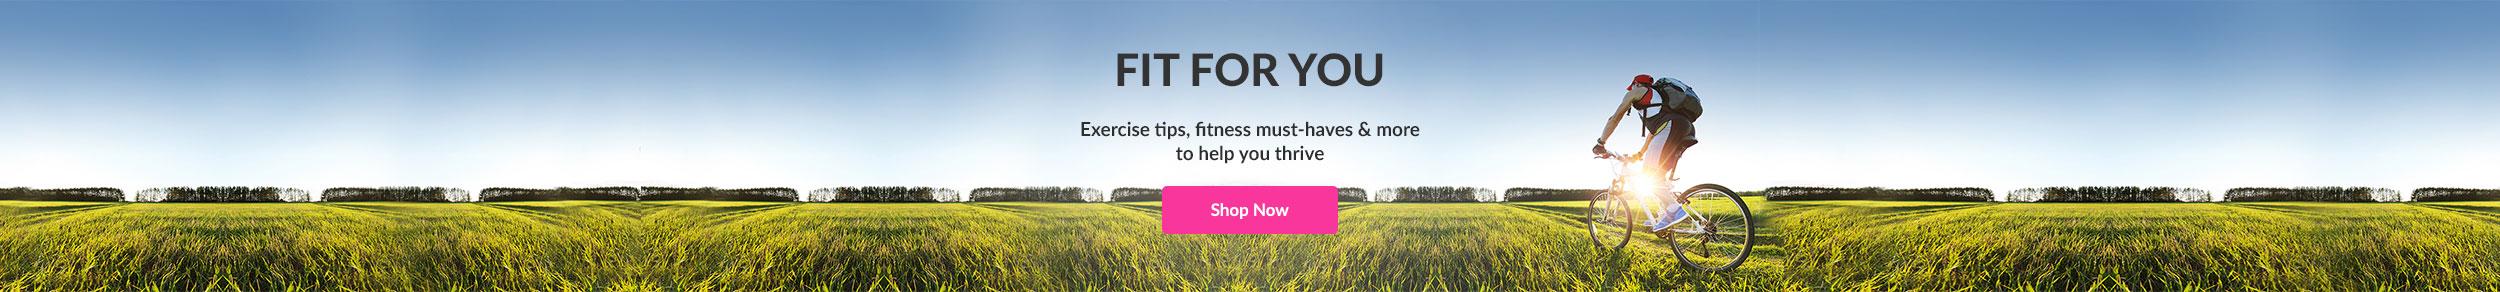 https://i3.pureformulas.net/images/static/Fitness_Fit_for_You_Store-Slide_121018.jpg